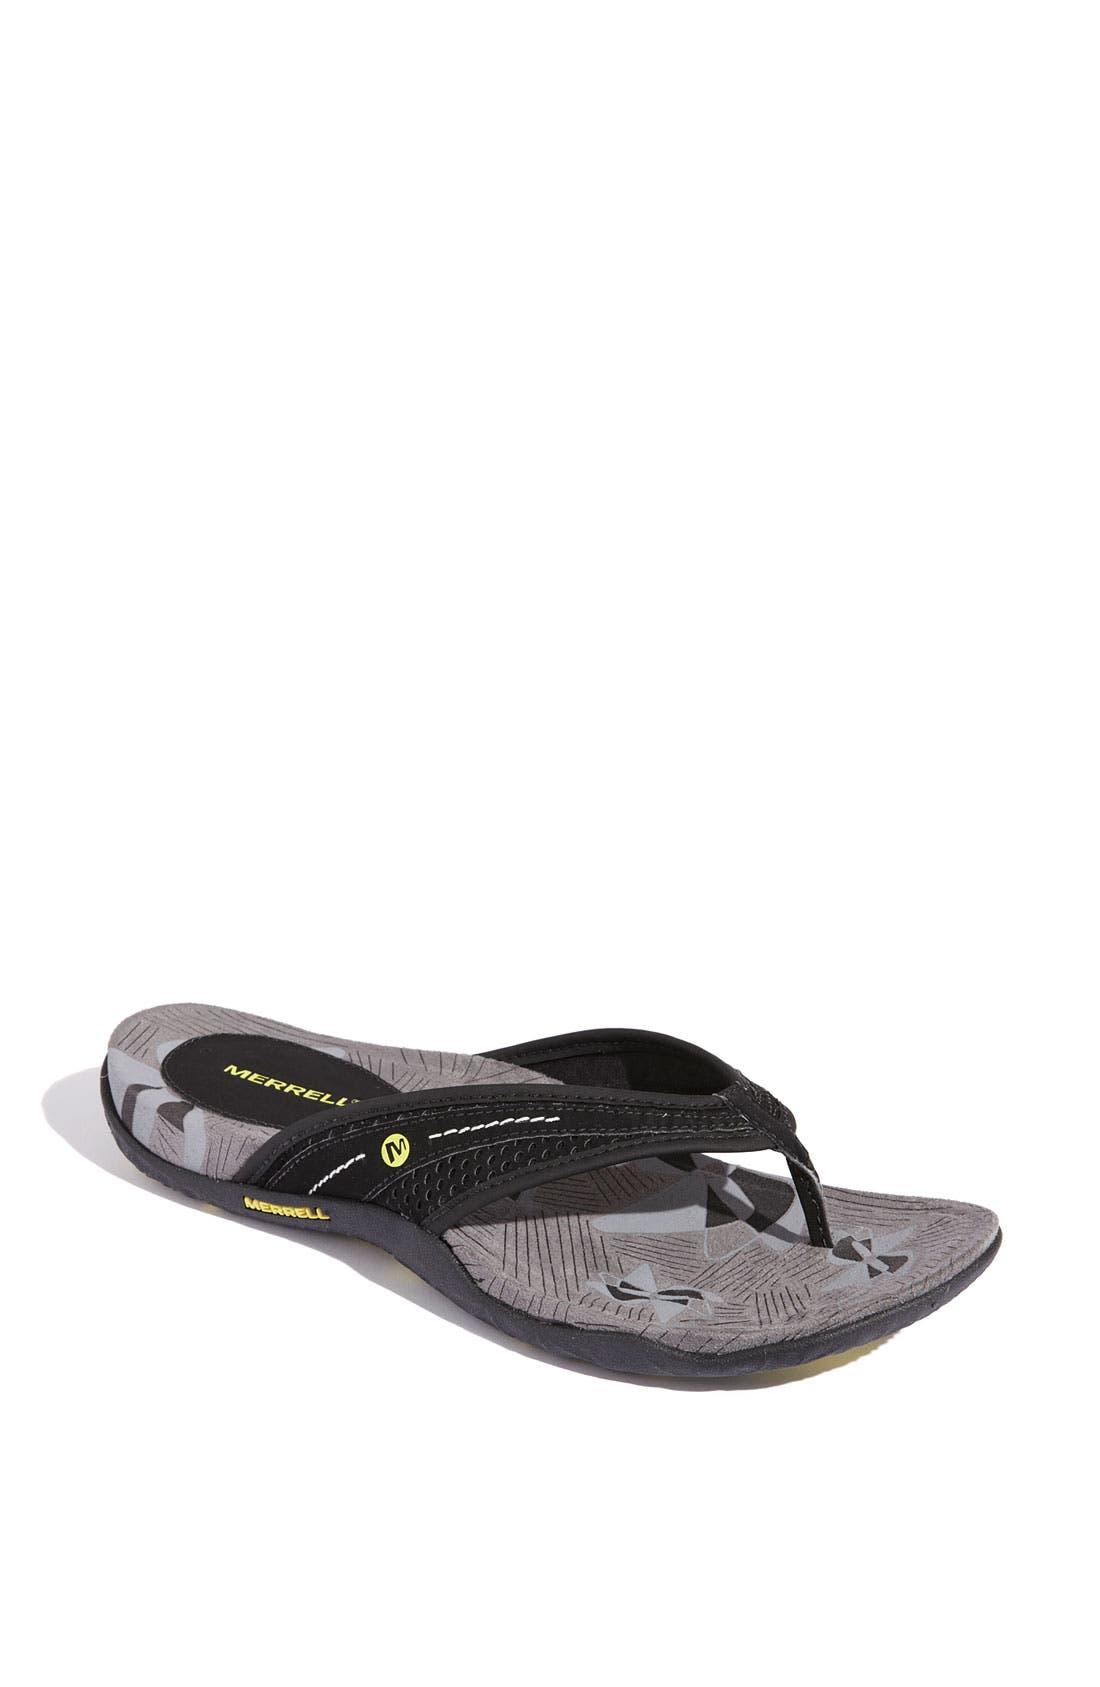 Main Image - Merrell 'Lorelei' Sandal